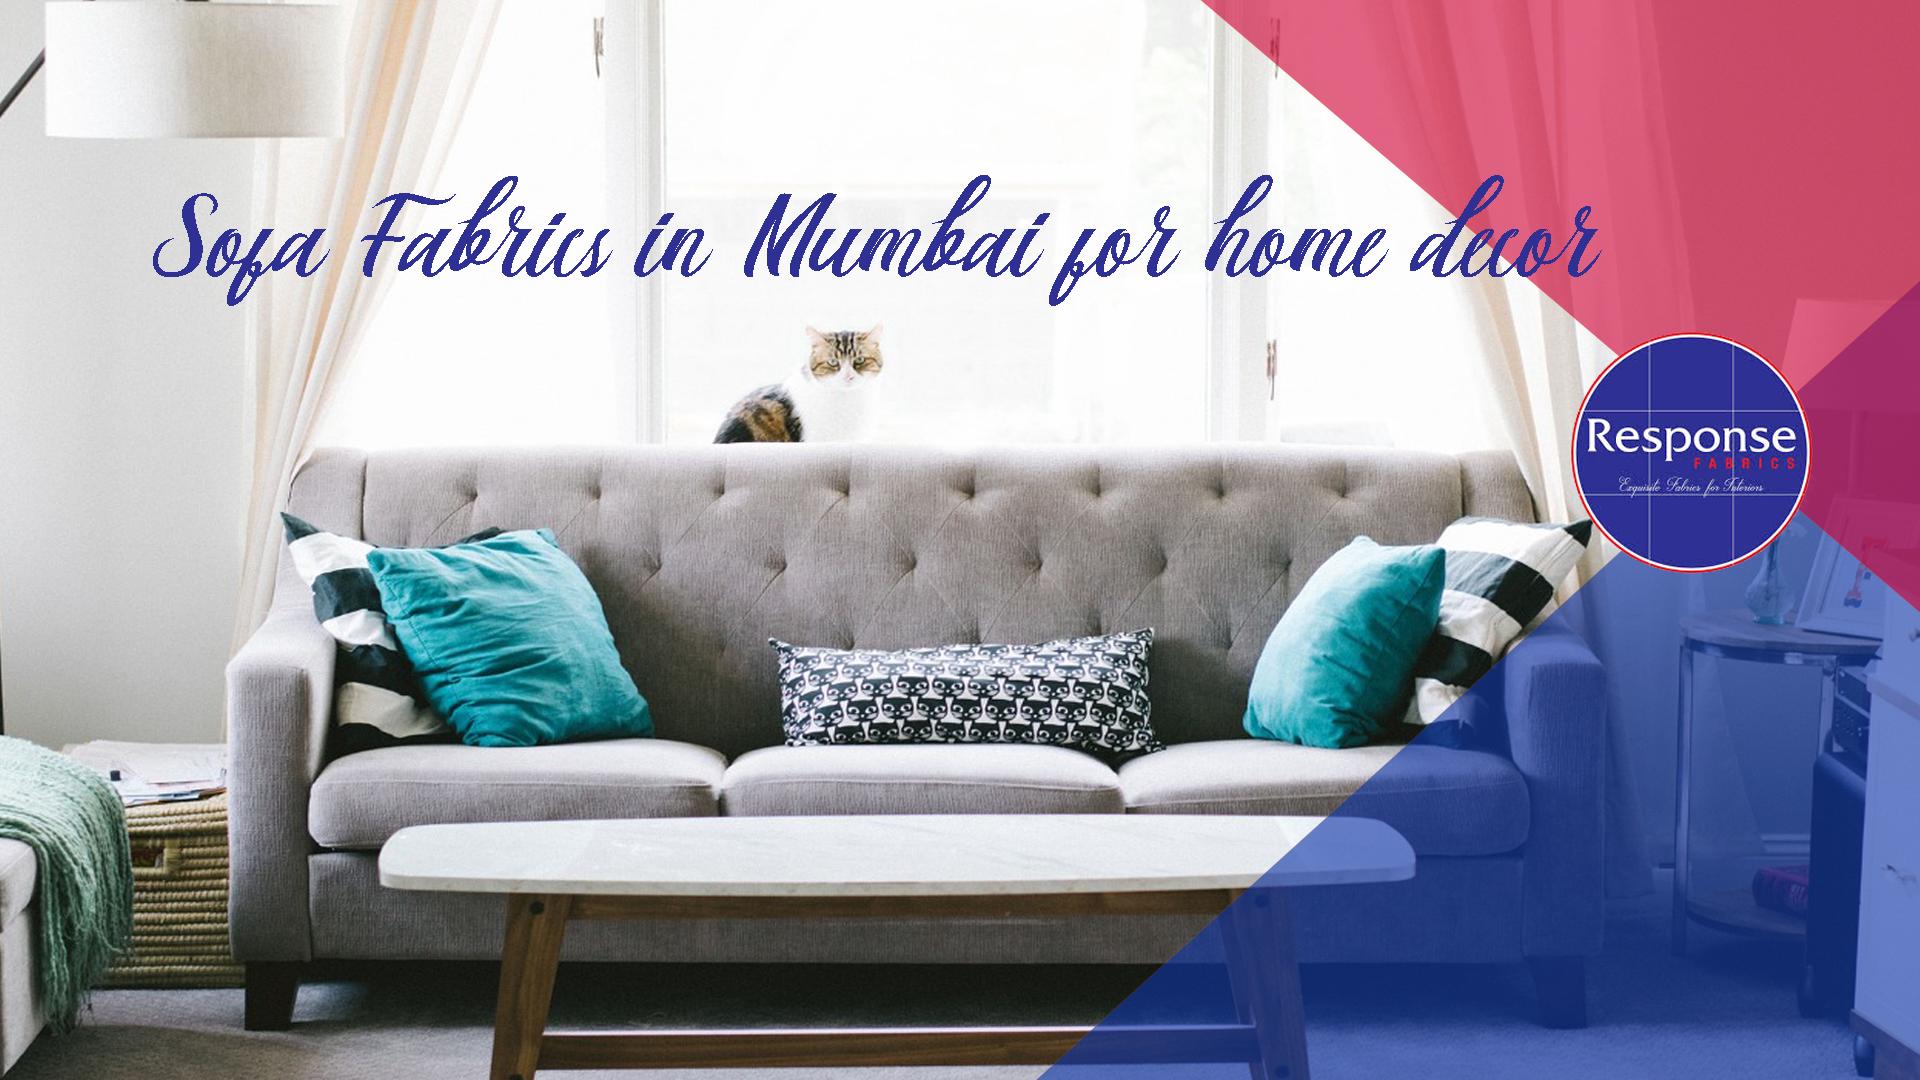 Sofa-fabrics-in-Mumbai-for-home-decor